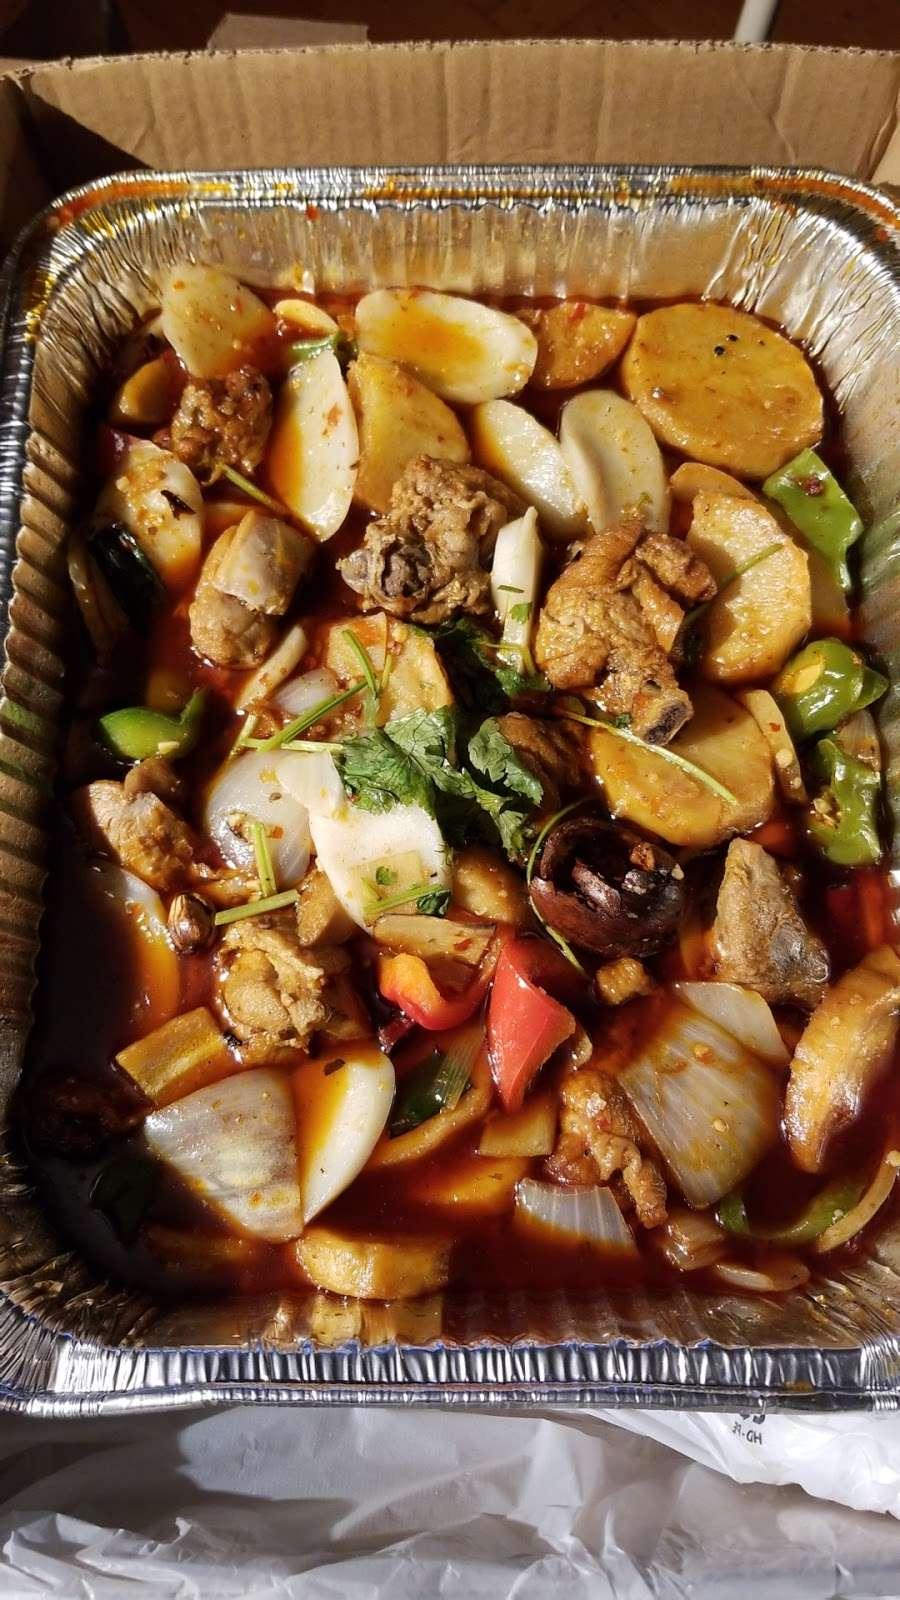 King Szechuan Palace - restaurant  | Photo 5 of 10 | Address: 83 Reservoir Ave, Jersey City, NJ 07307, USA | Phone: (201) 222-6888